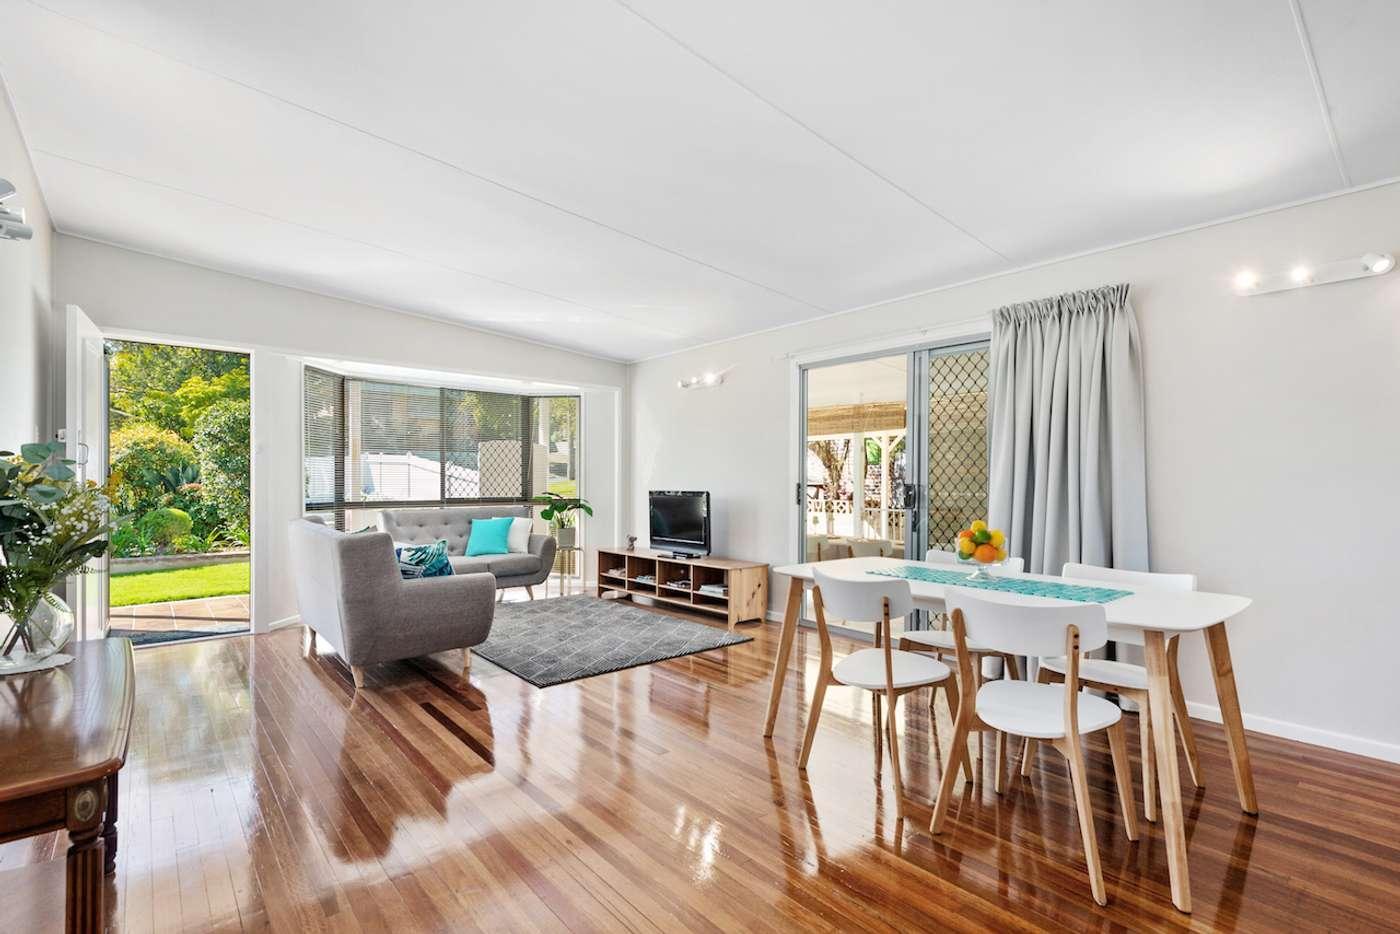 Main view of Homely house listing, 31 Suncroft Street, Mount Gravatt QLD 4122